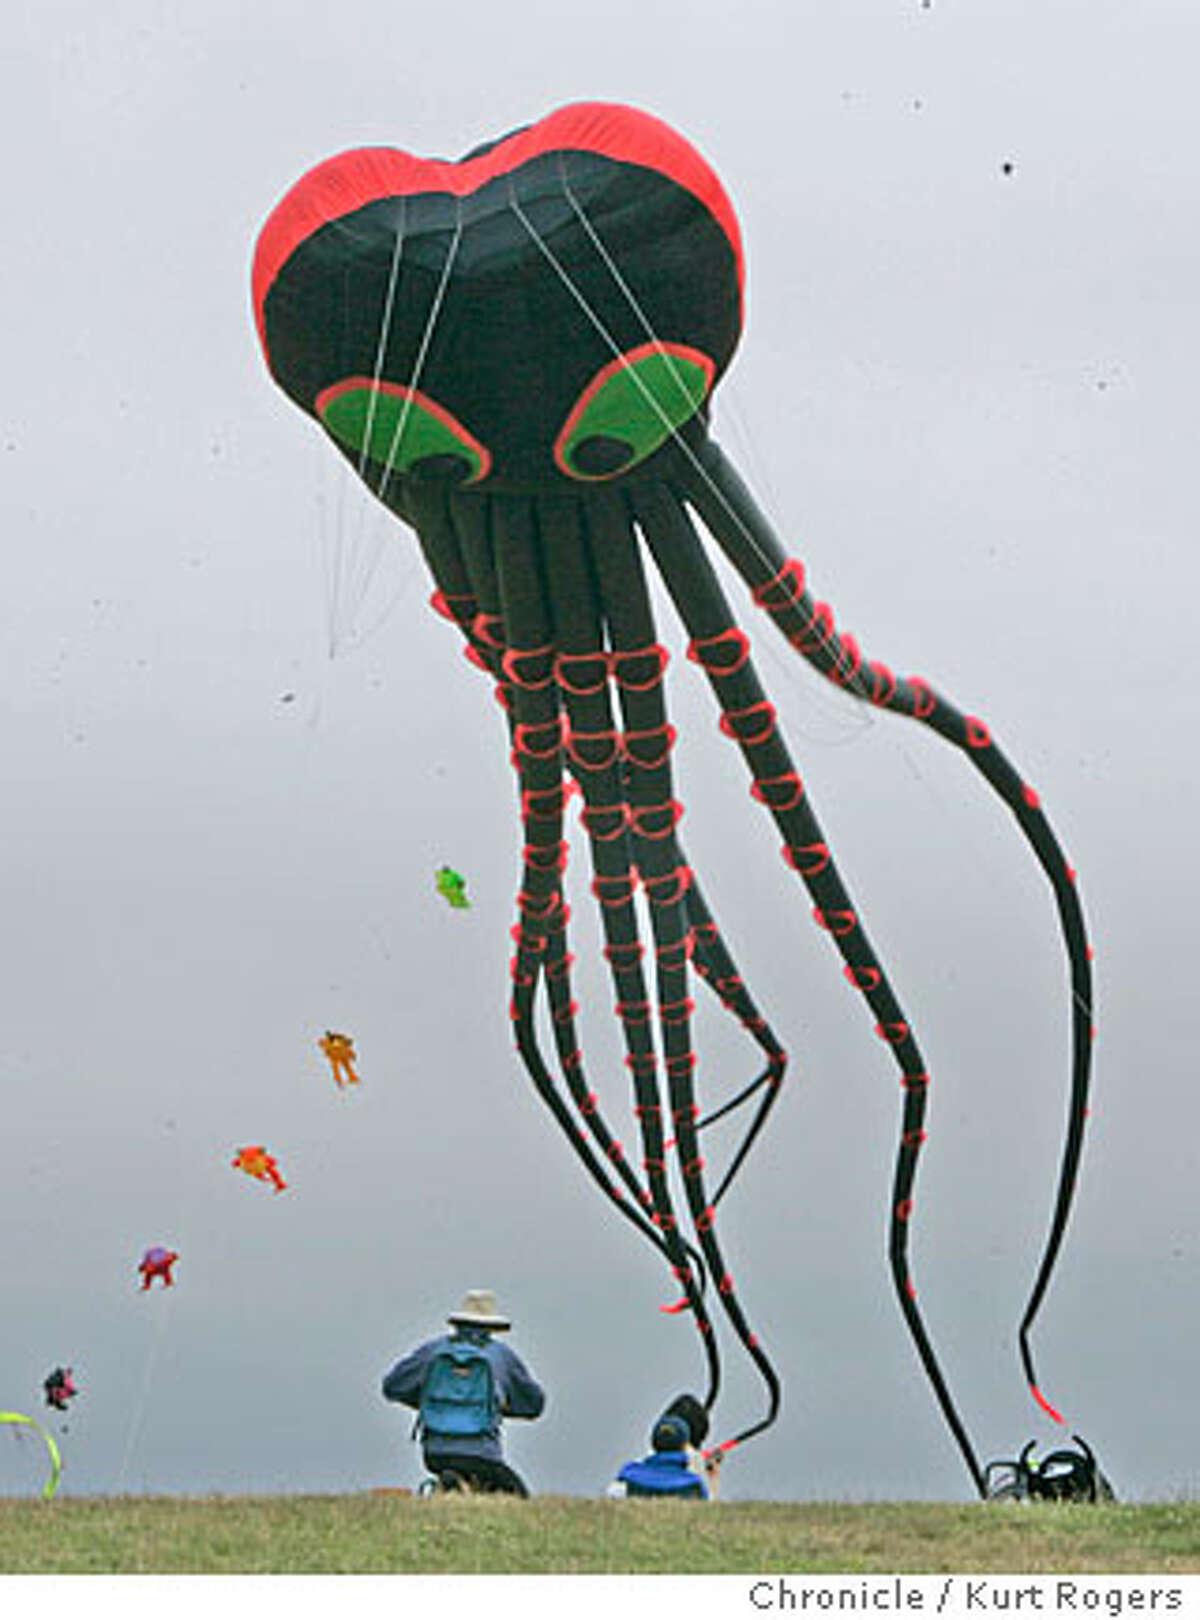 The Berkeley Kite Wranglers broke a new world record by flying 10 octopi at berkeley marina KURT ROGERS/THE CHRONICLE SAN FRANCISCO THE CHRONICLE SFC